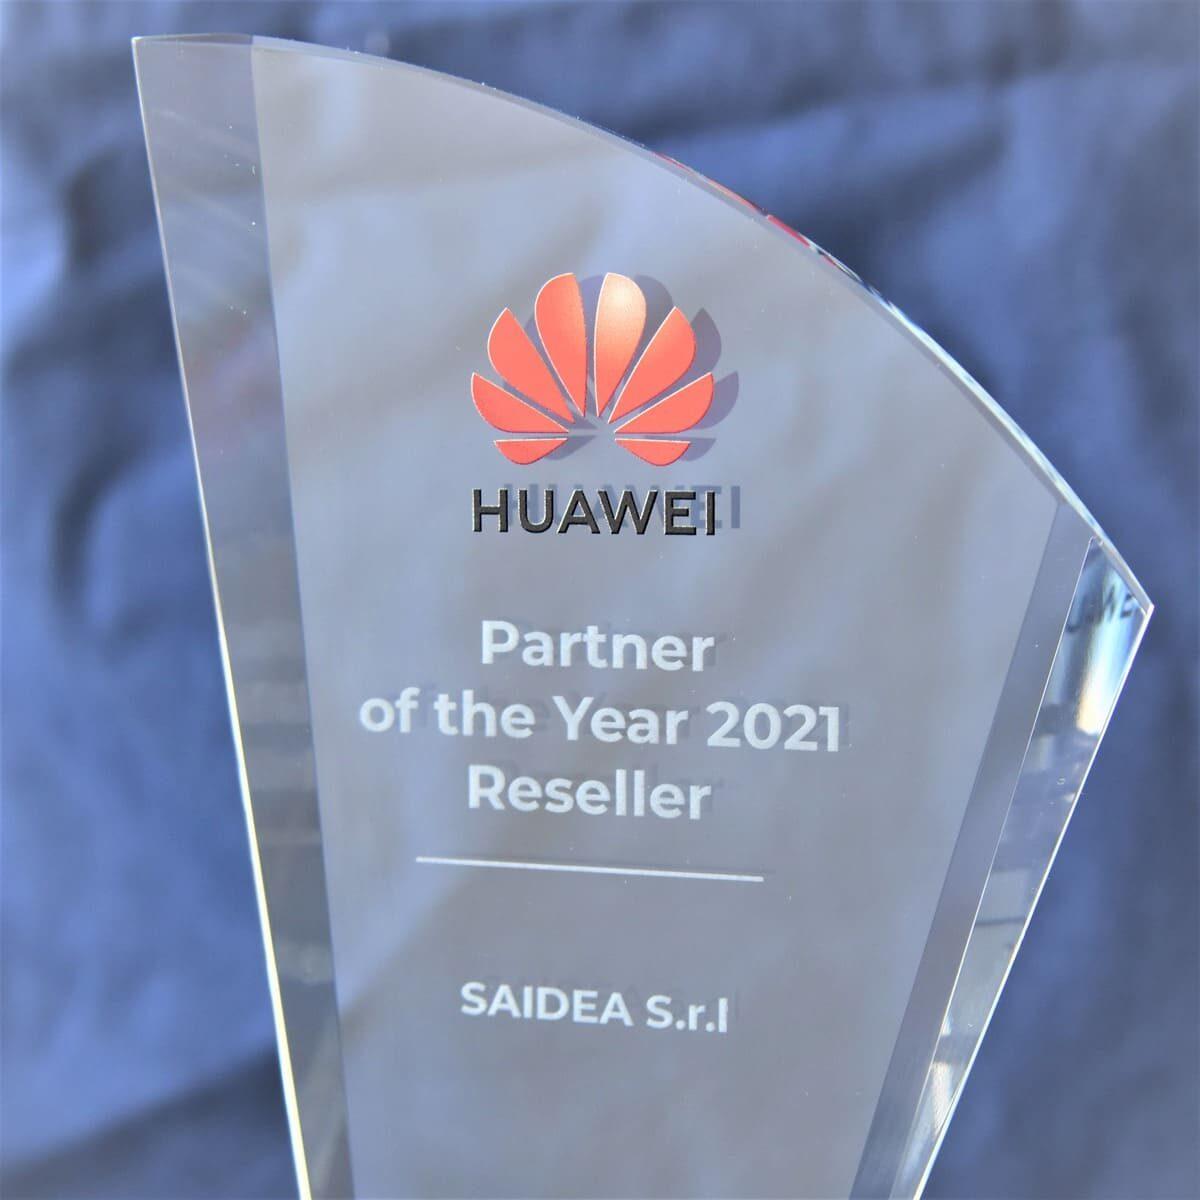 Premio Huawei 2021